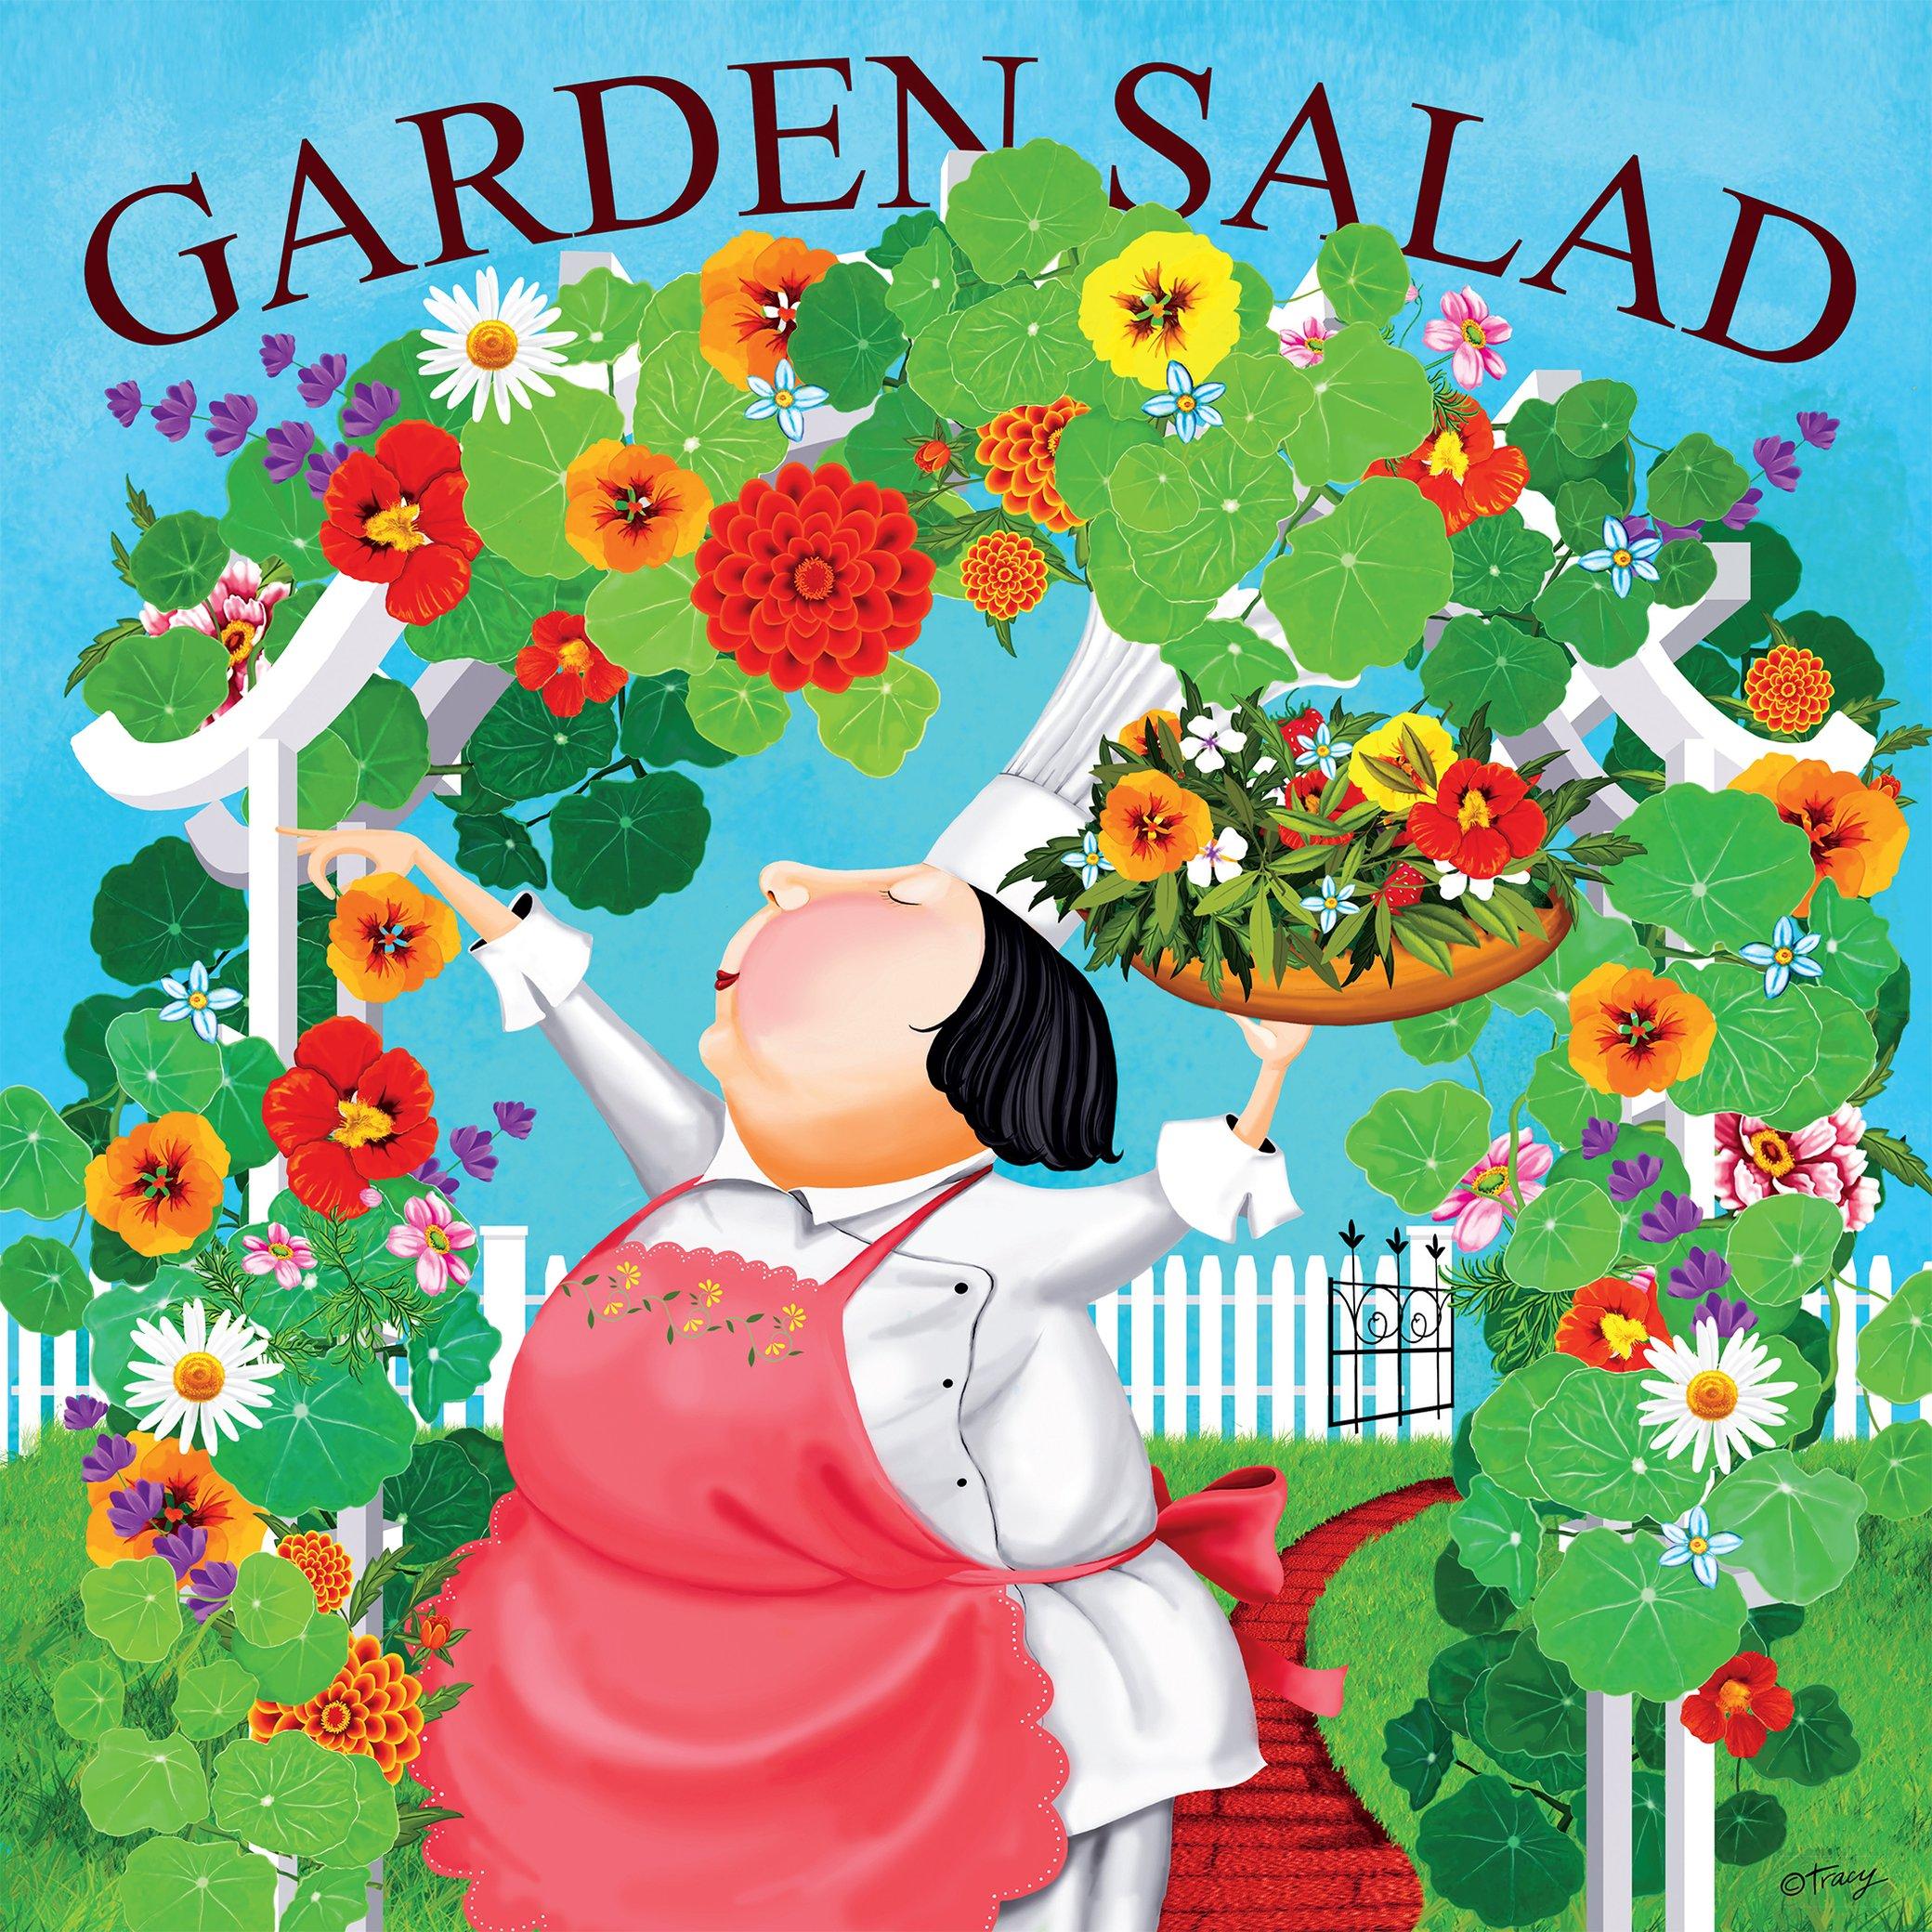 Garden Salad Garden Jigsaw Puzzle